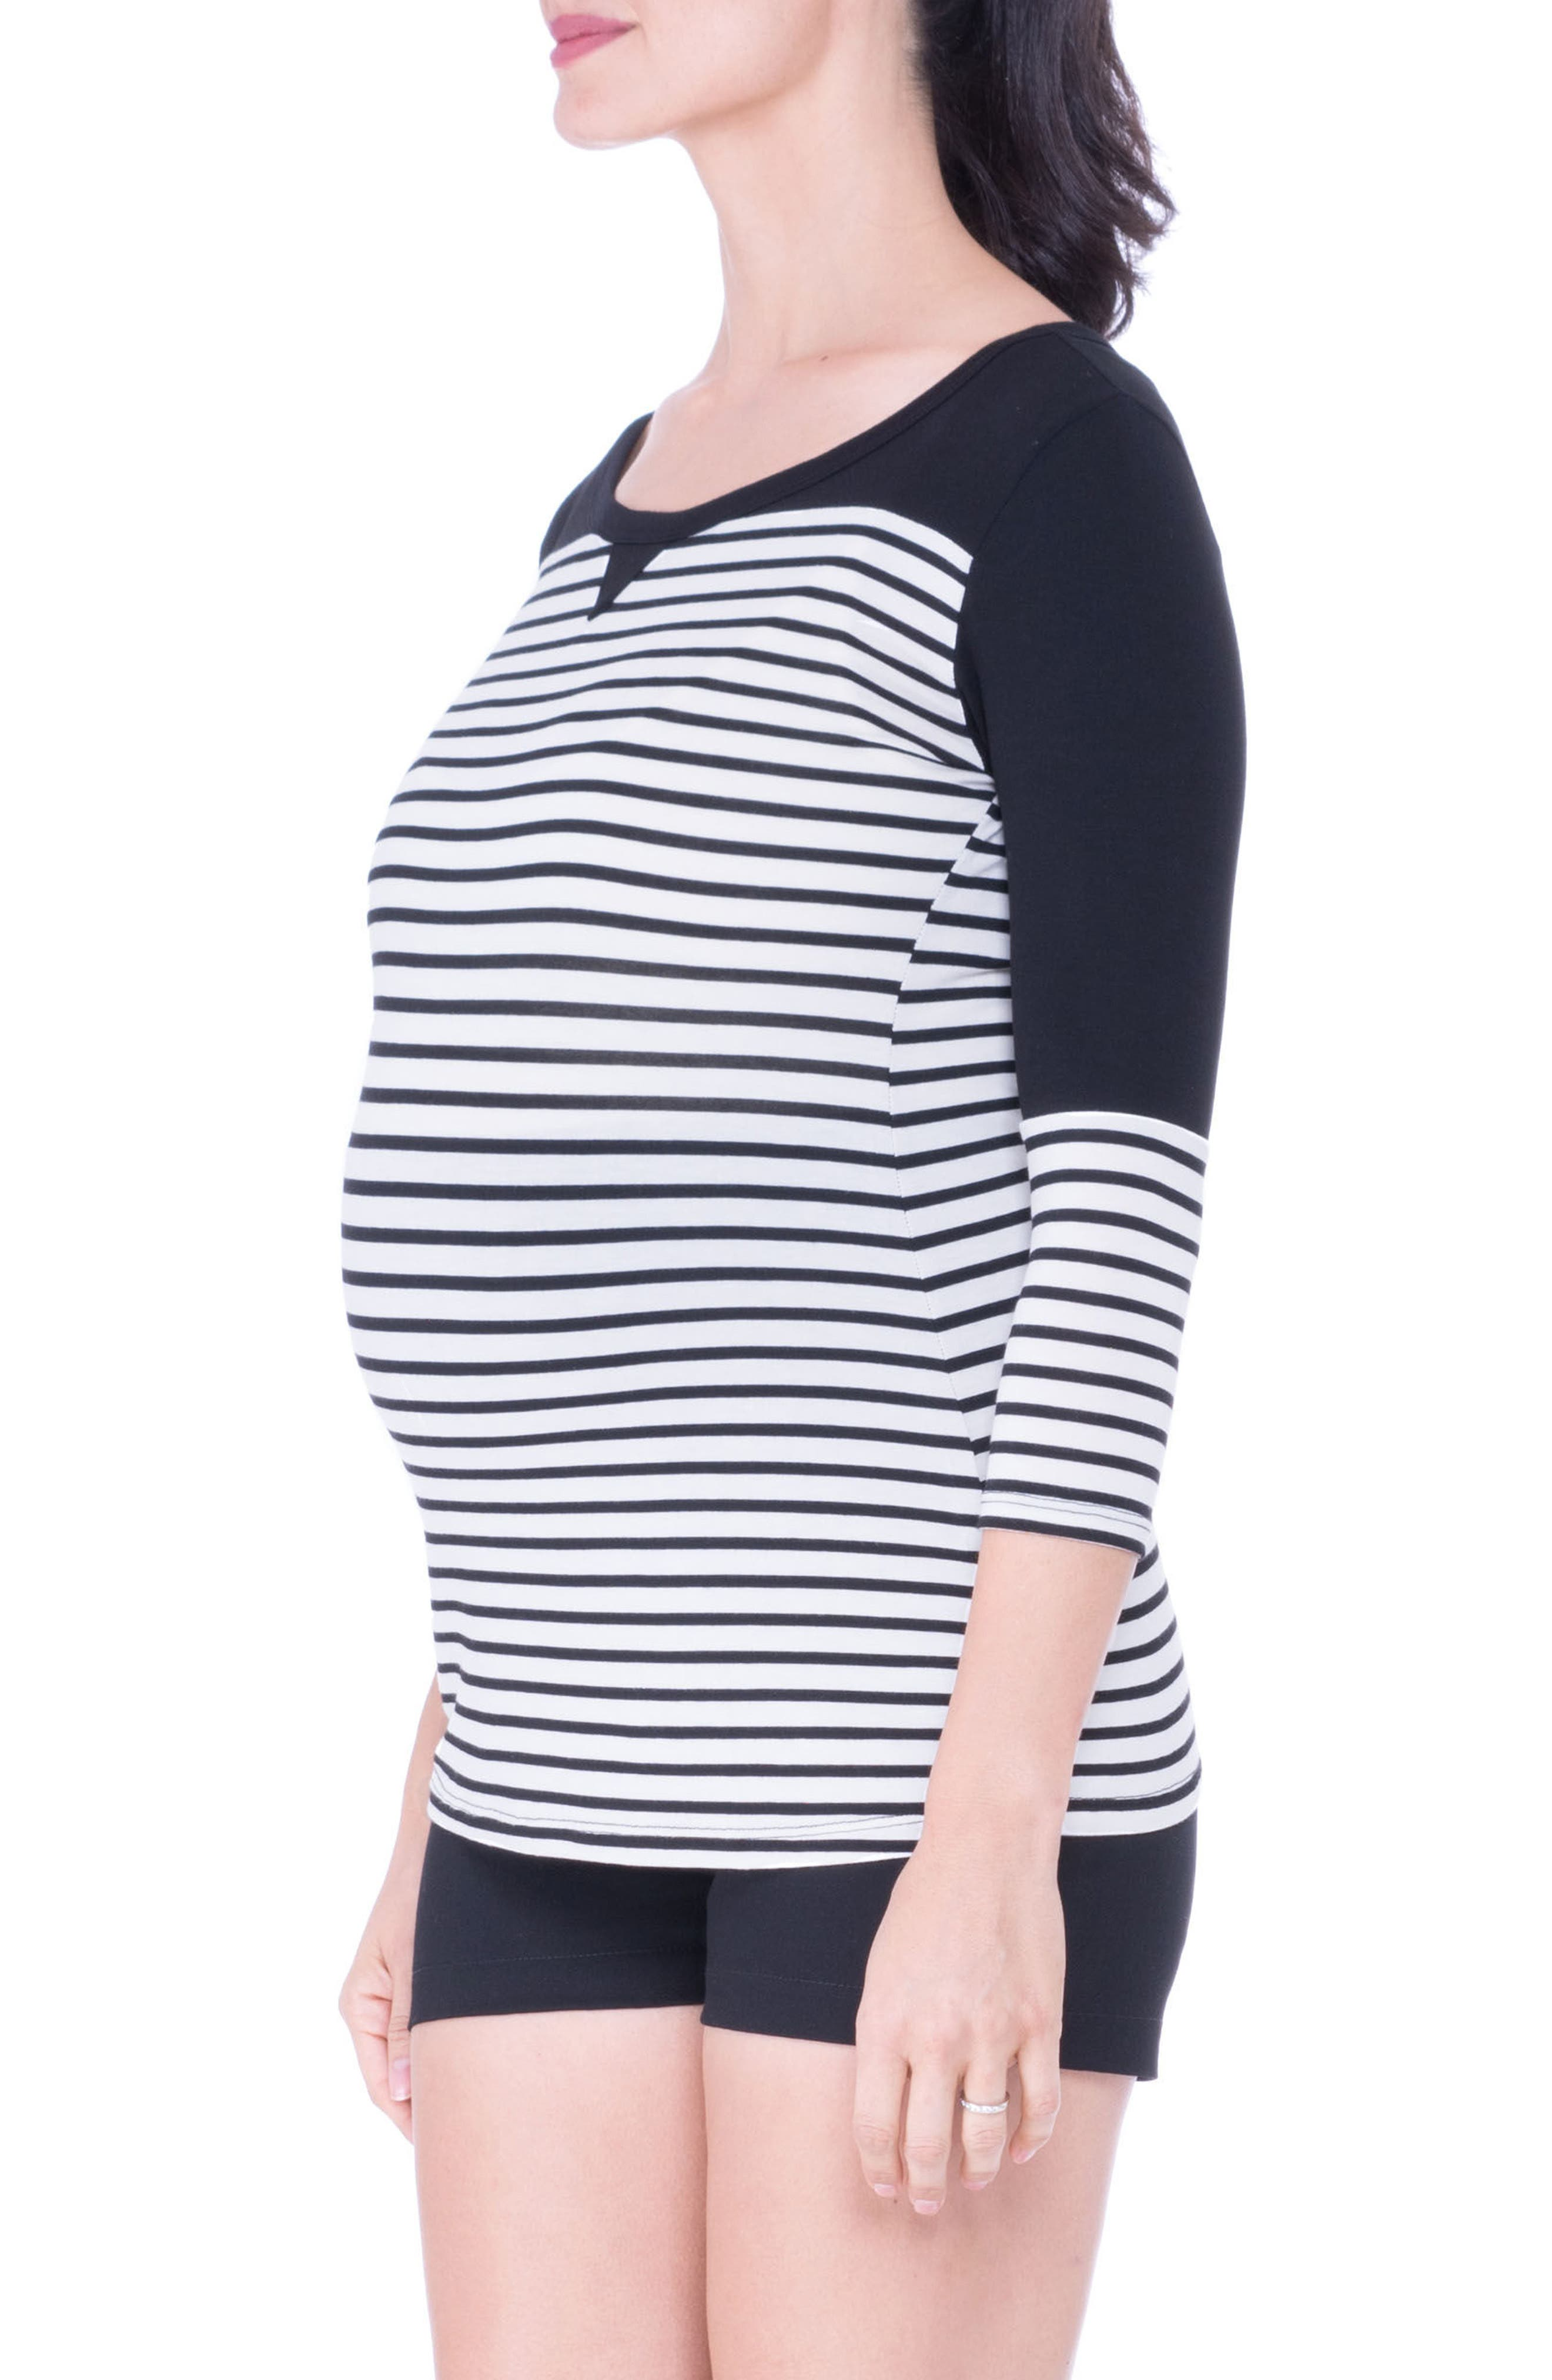 Main Image - Olian Stripe Maternity Tee